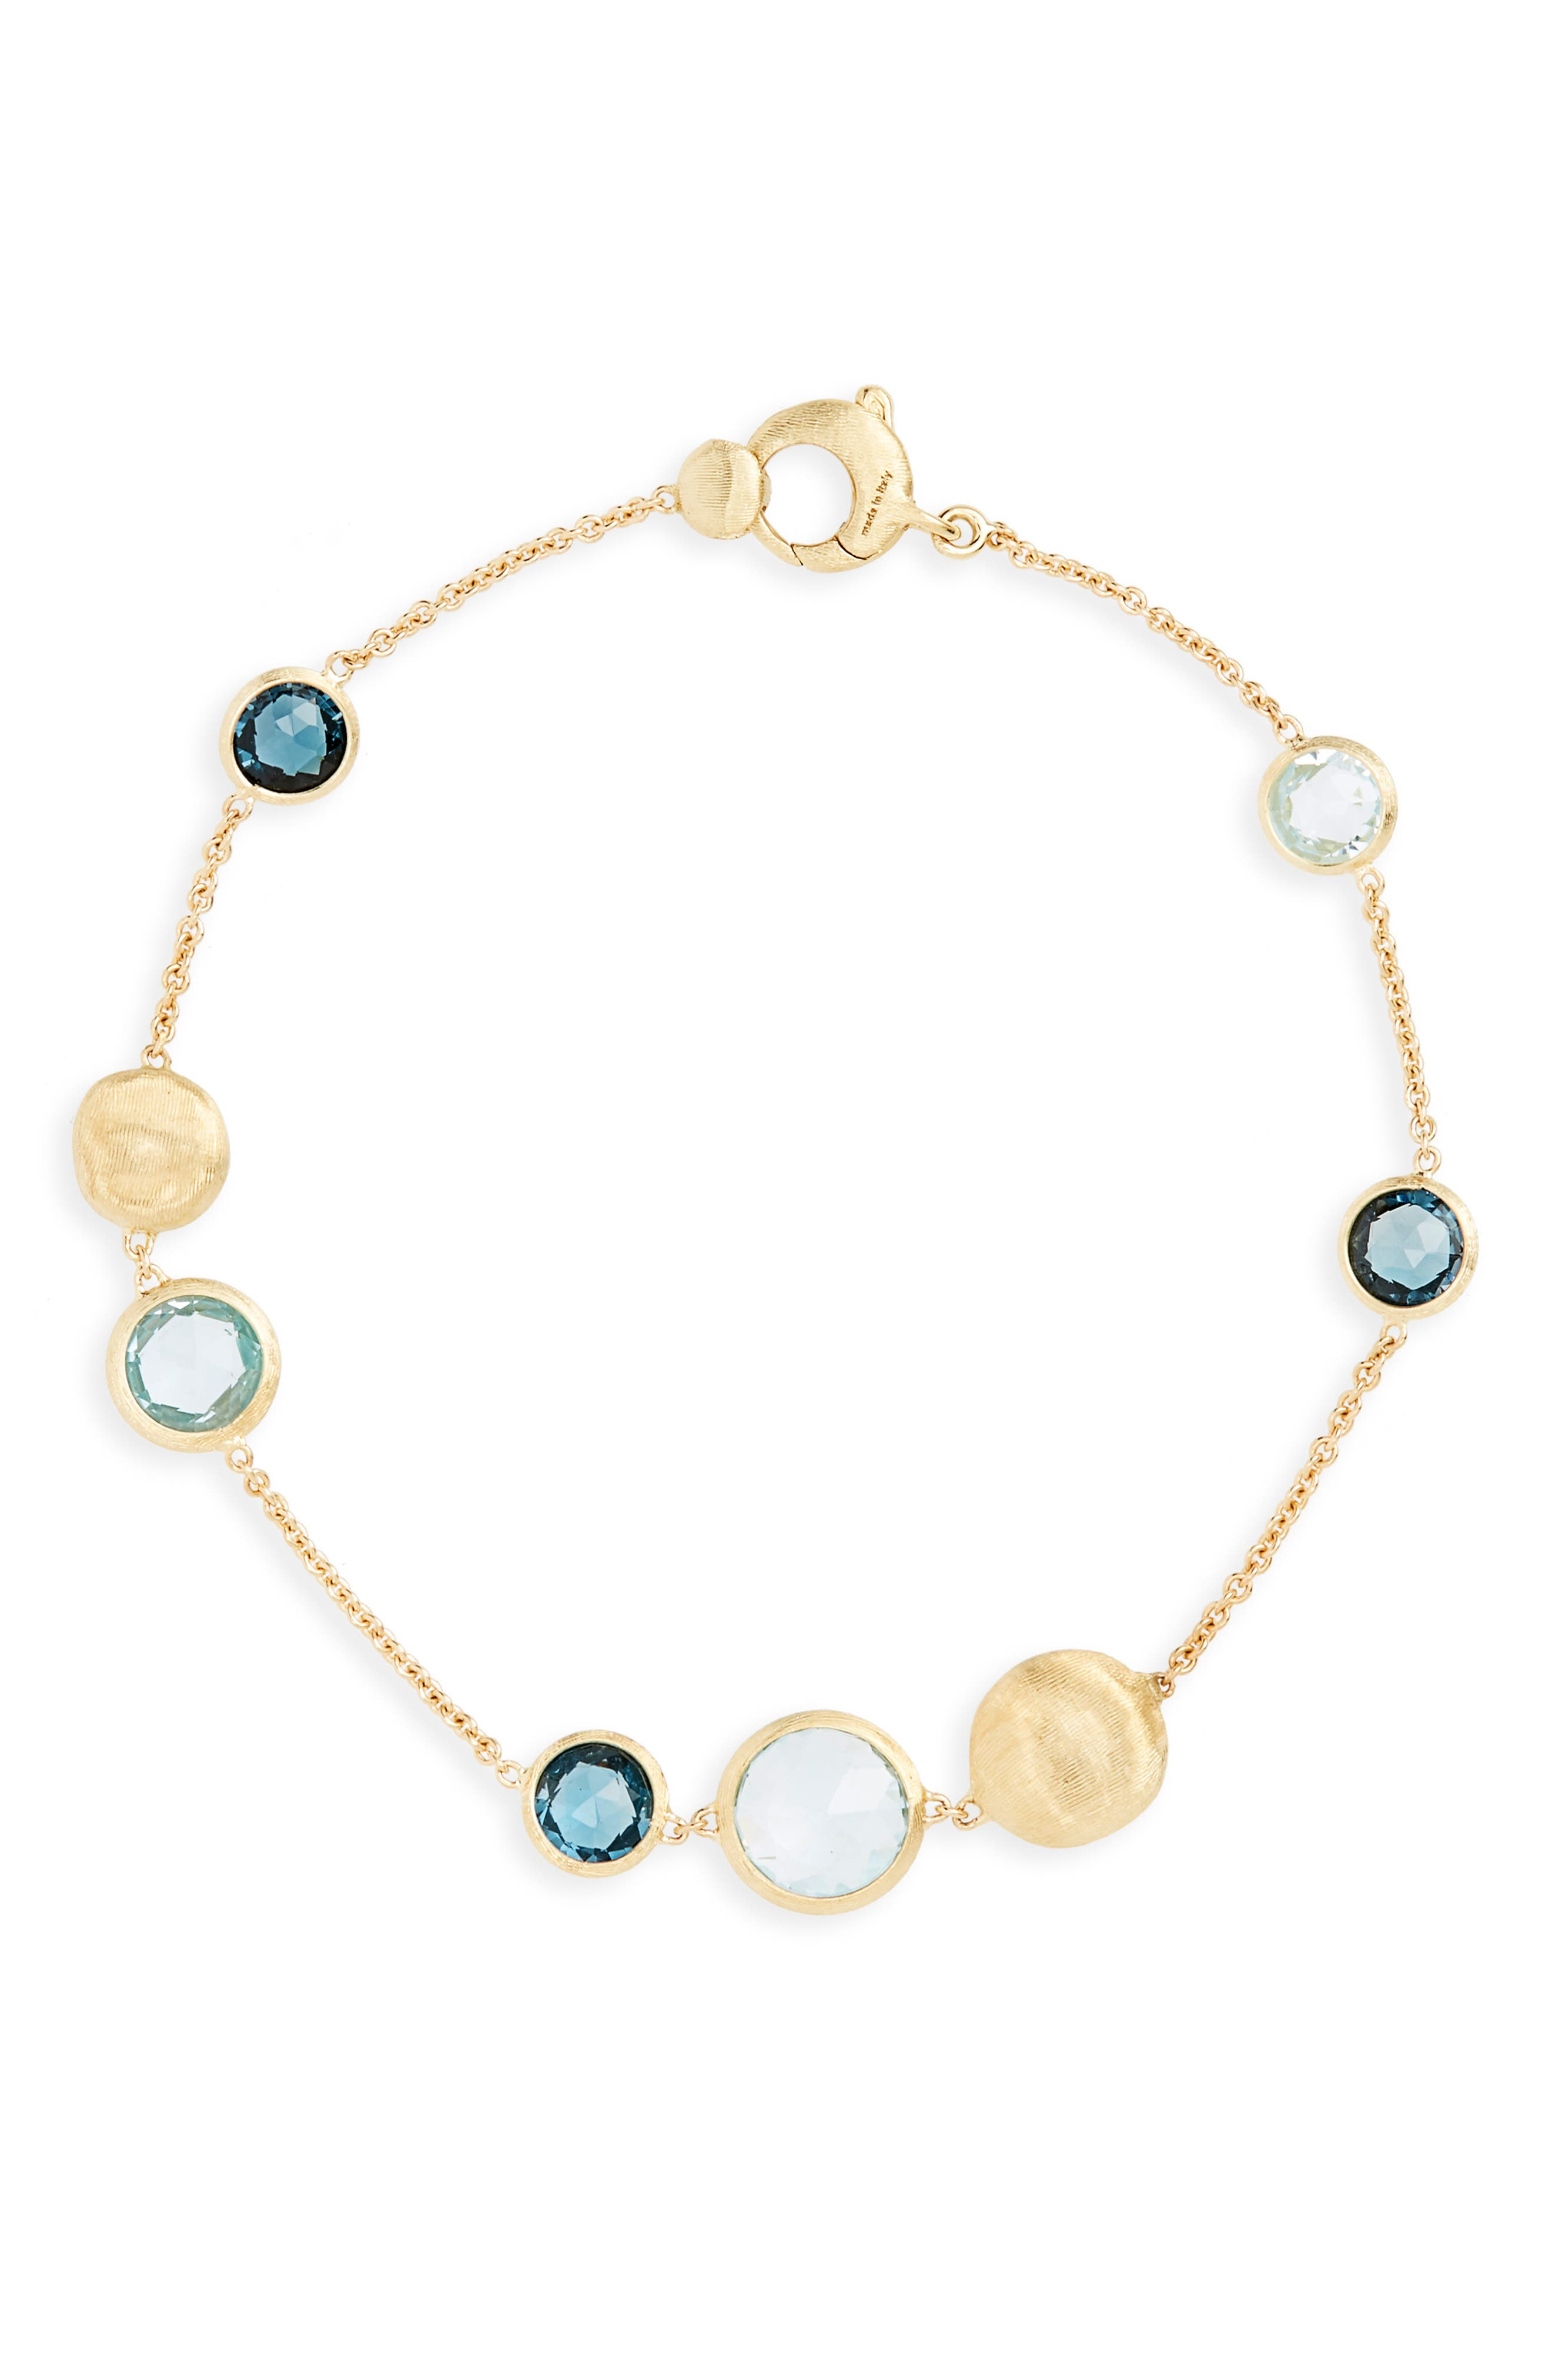 'Jaipur' Station Bracelet,                             Main thumbnail 1, color,                             YELLOW GOLD/ SWISS BLUE TOPAZ